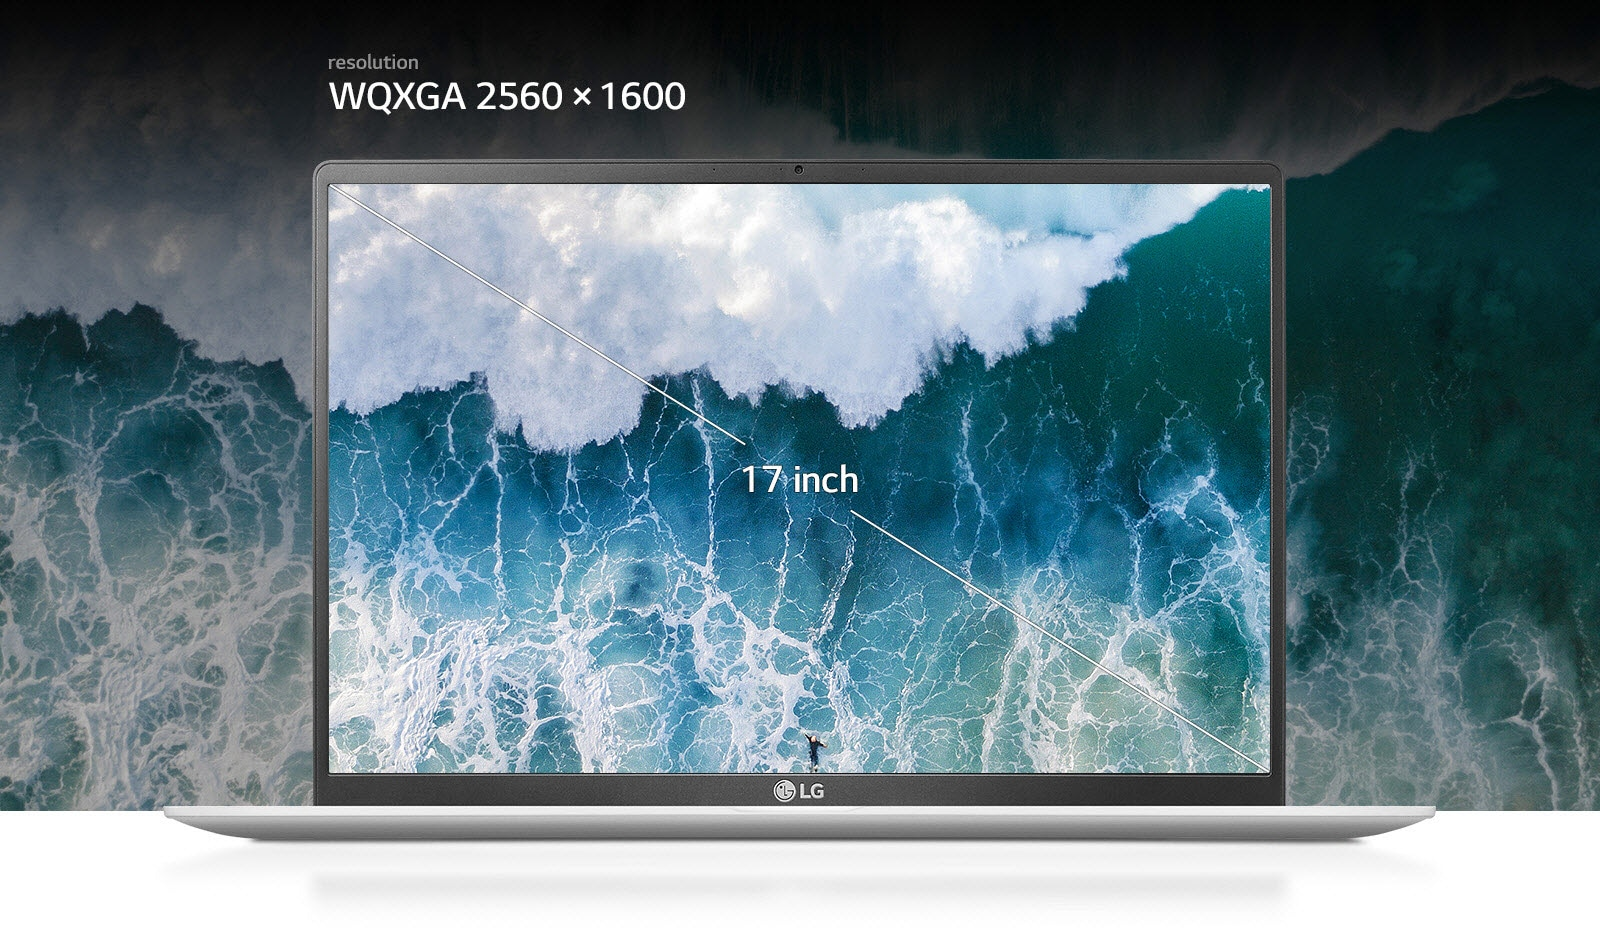 17 inch gram laptop IPS Display with 16:10 aspect ratio